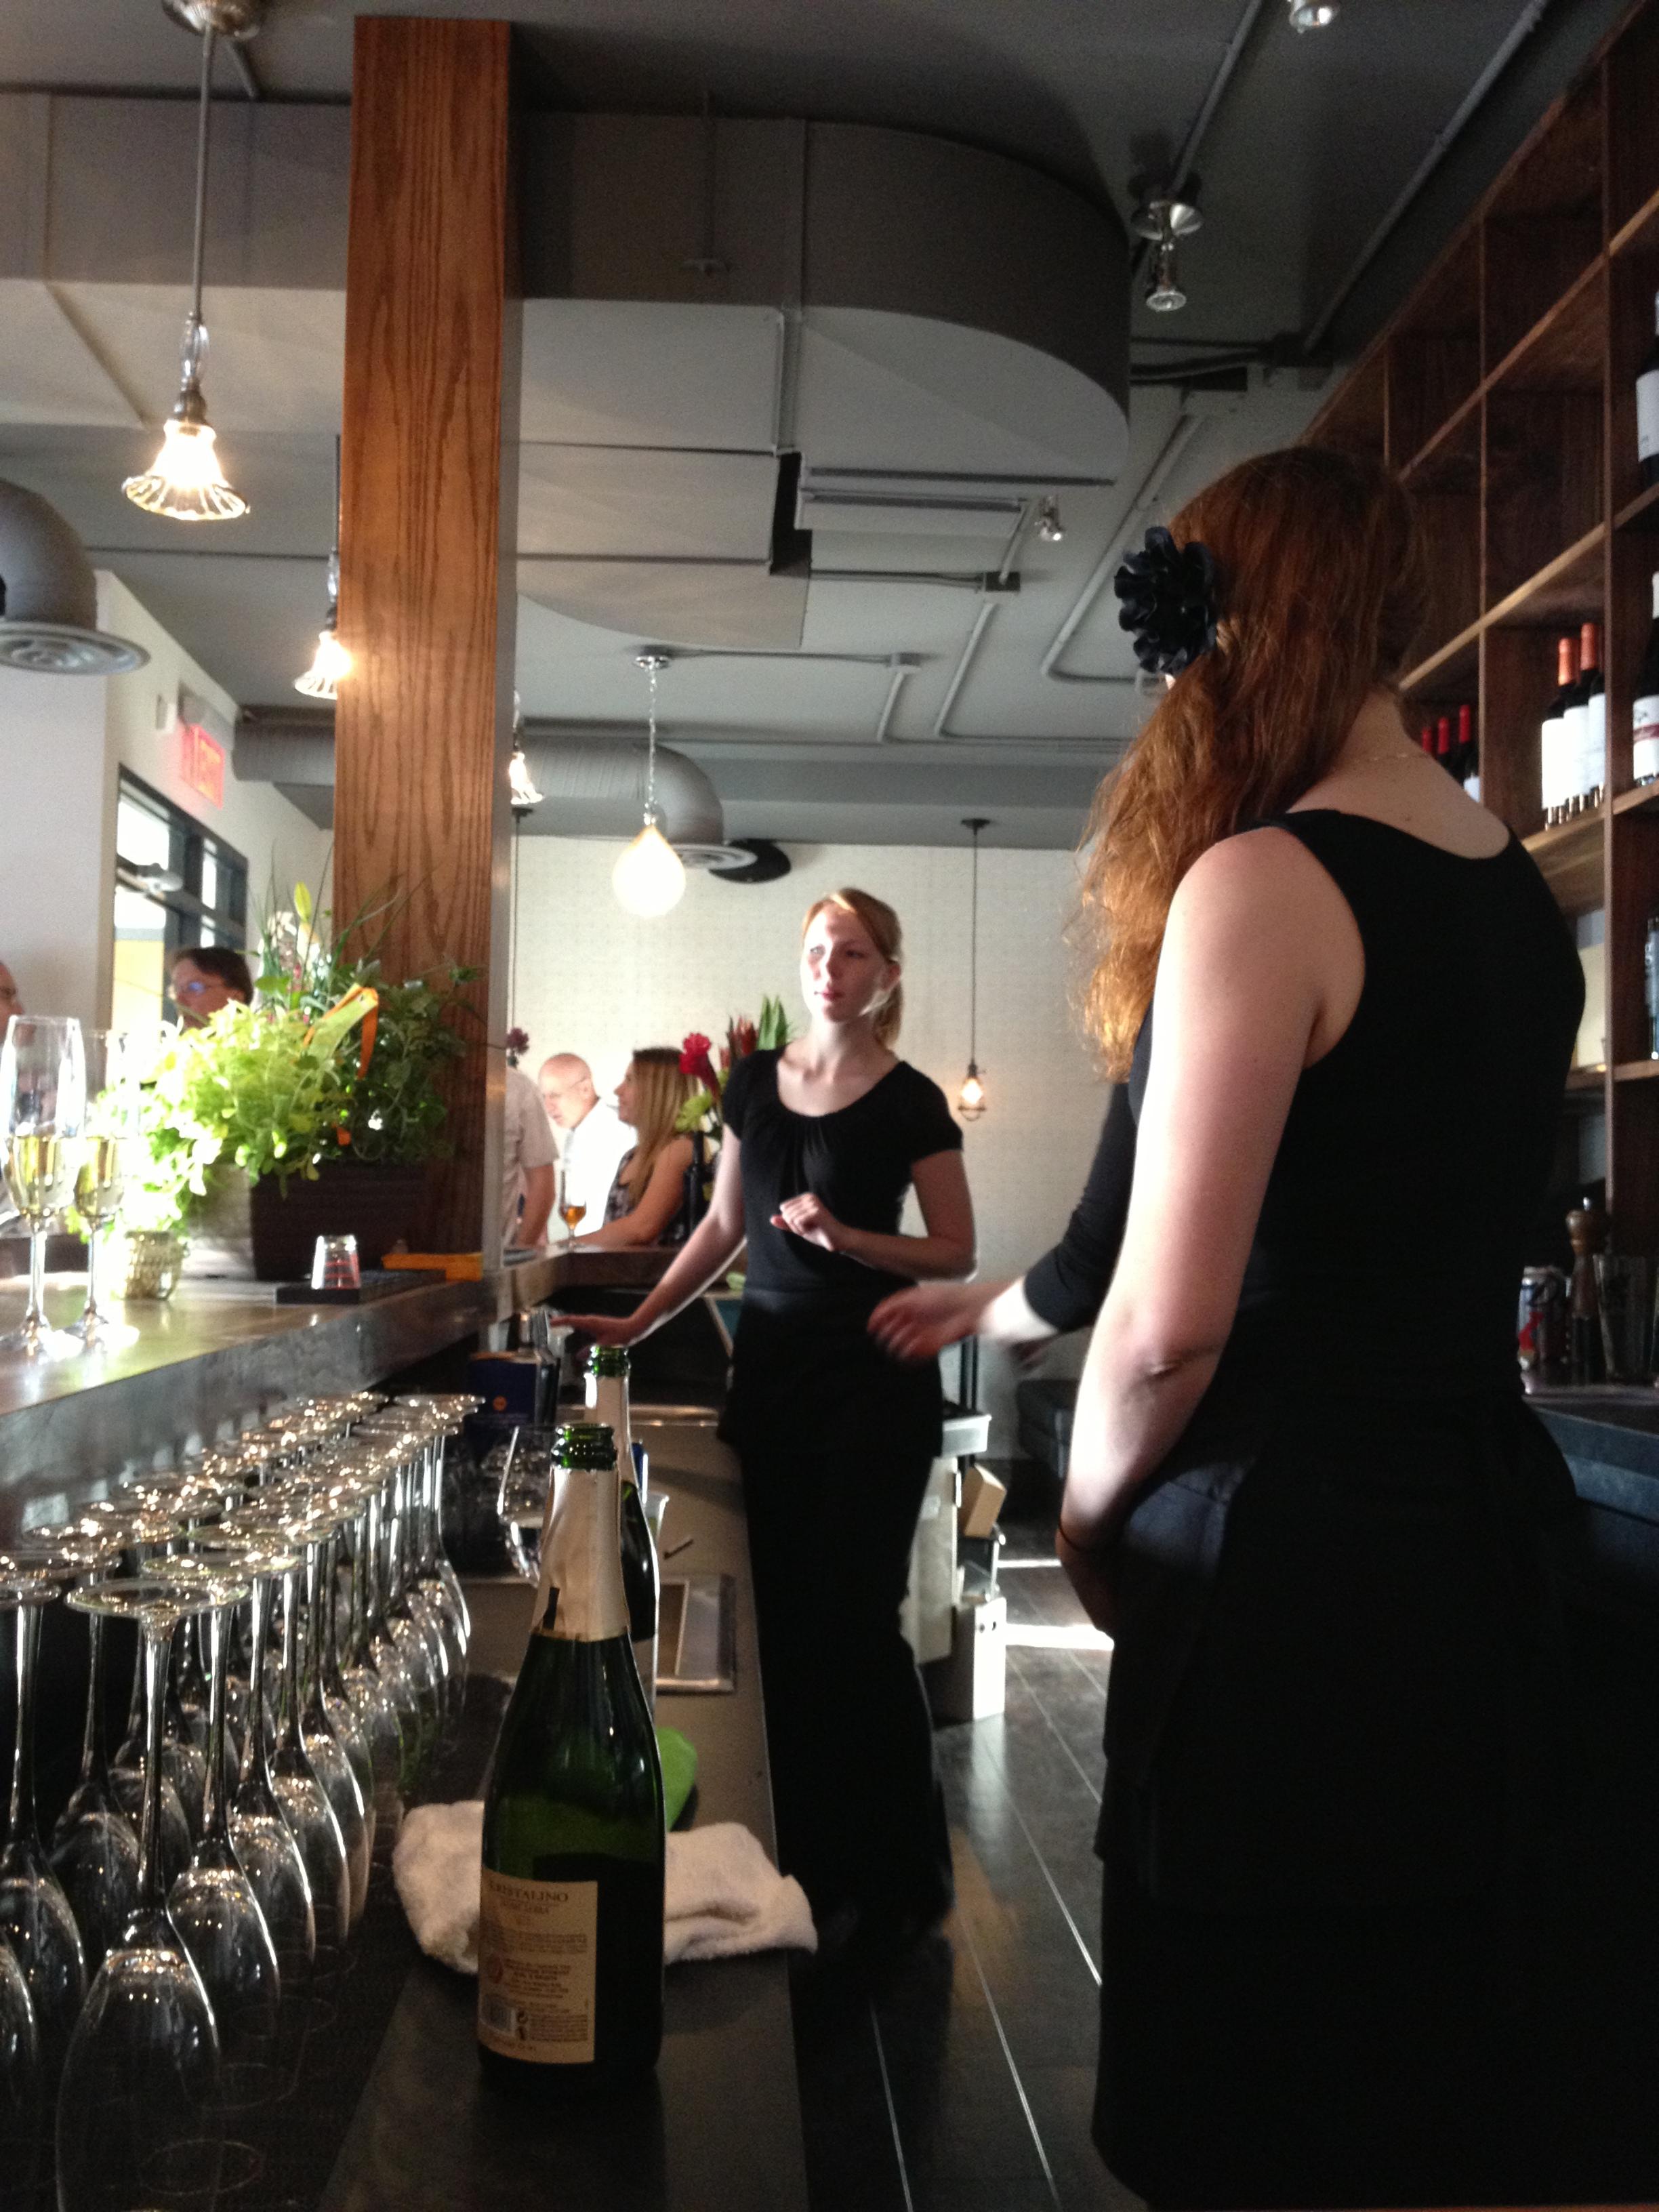 Behind the bar.